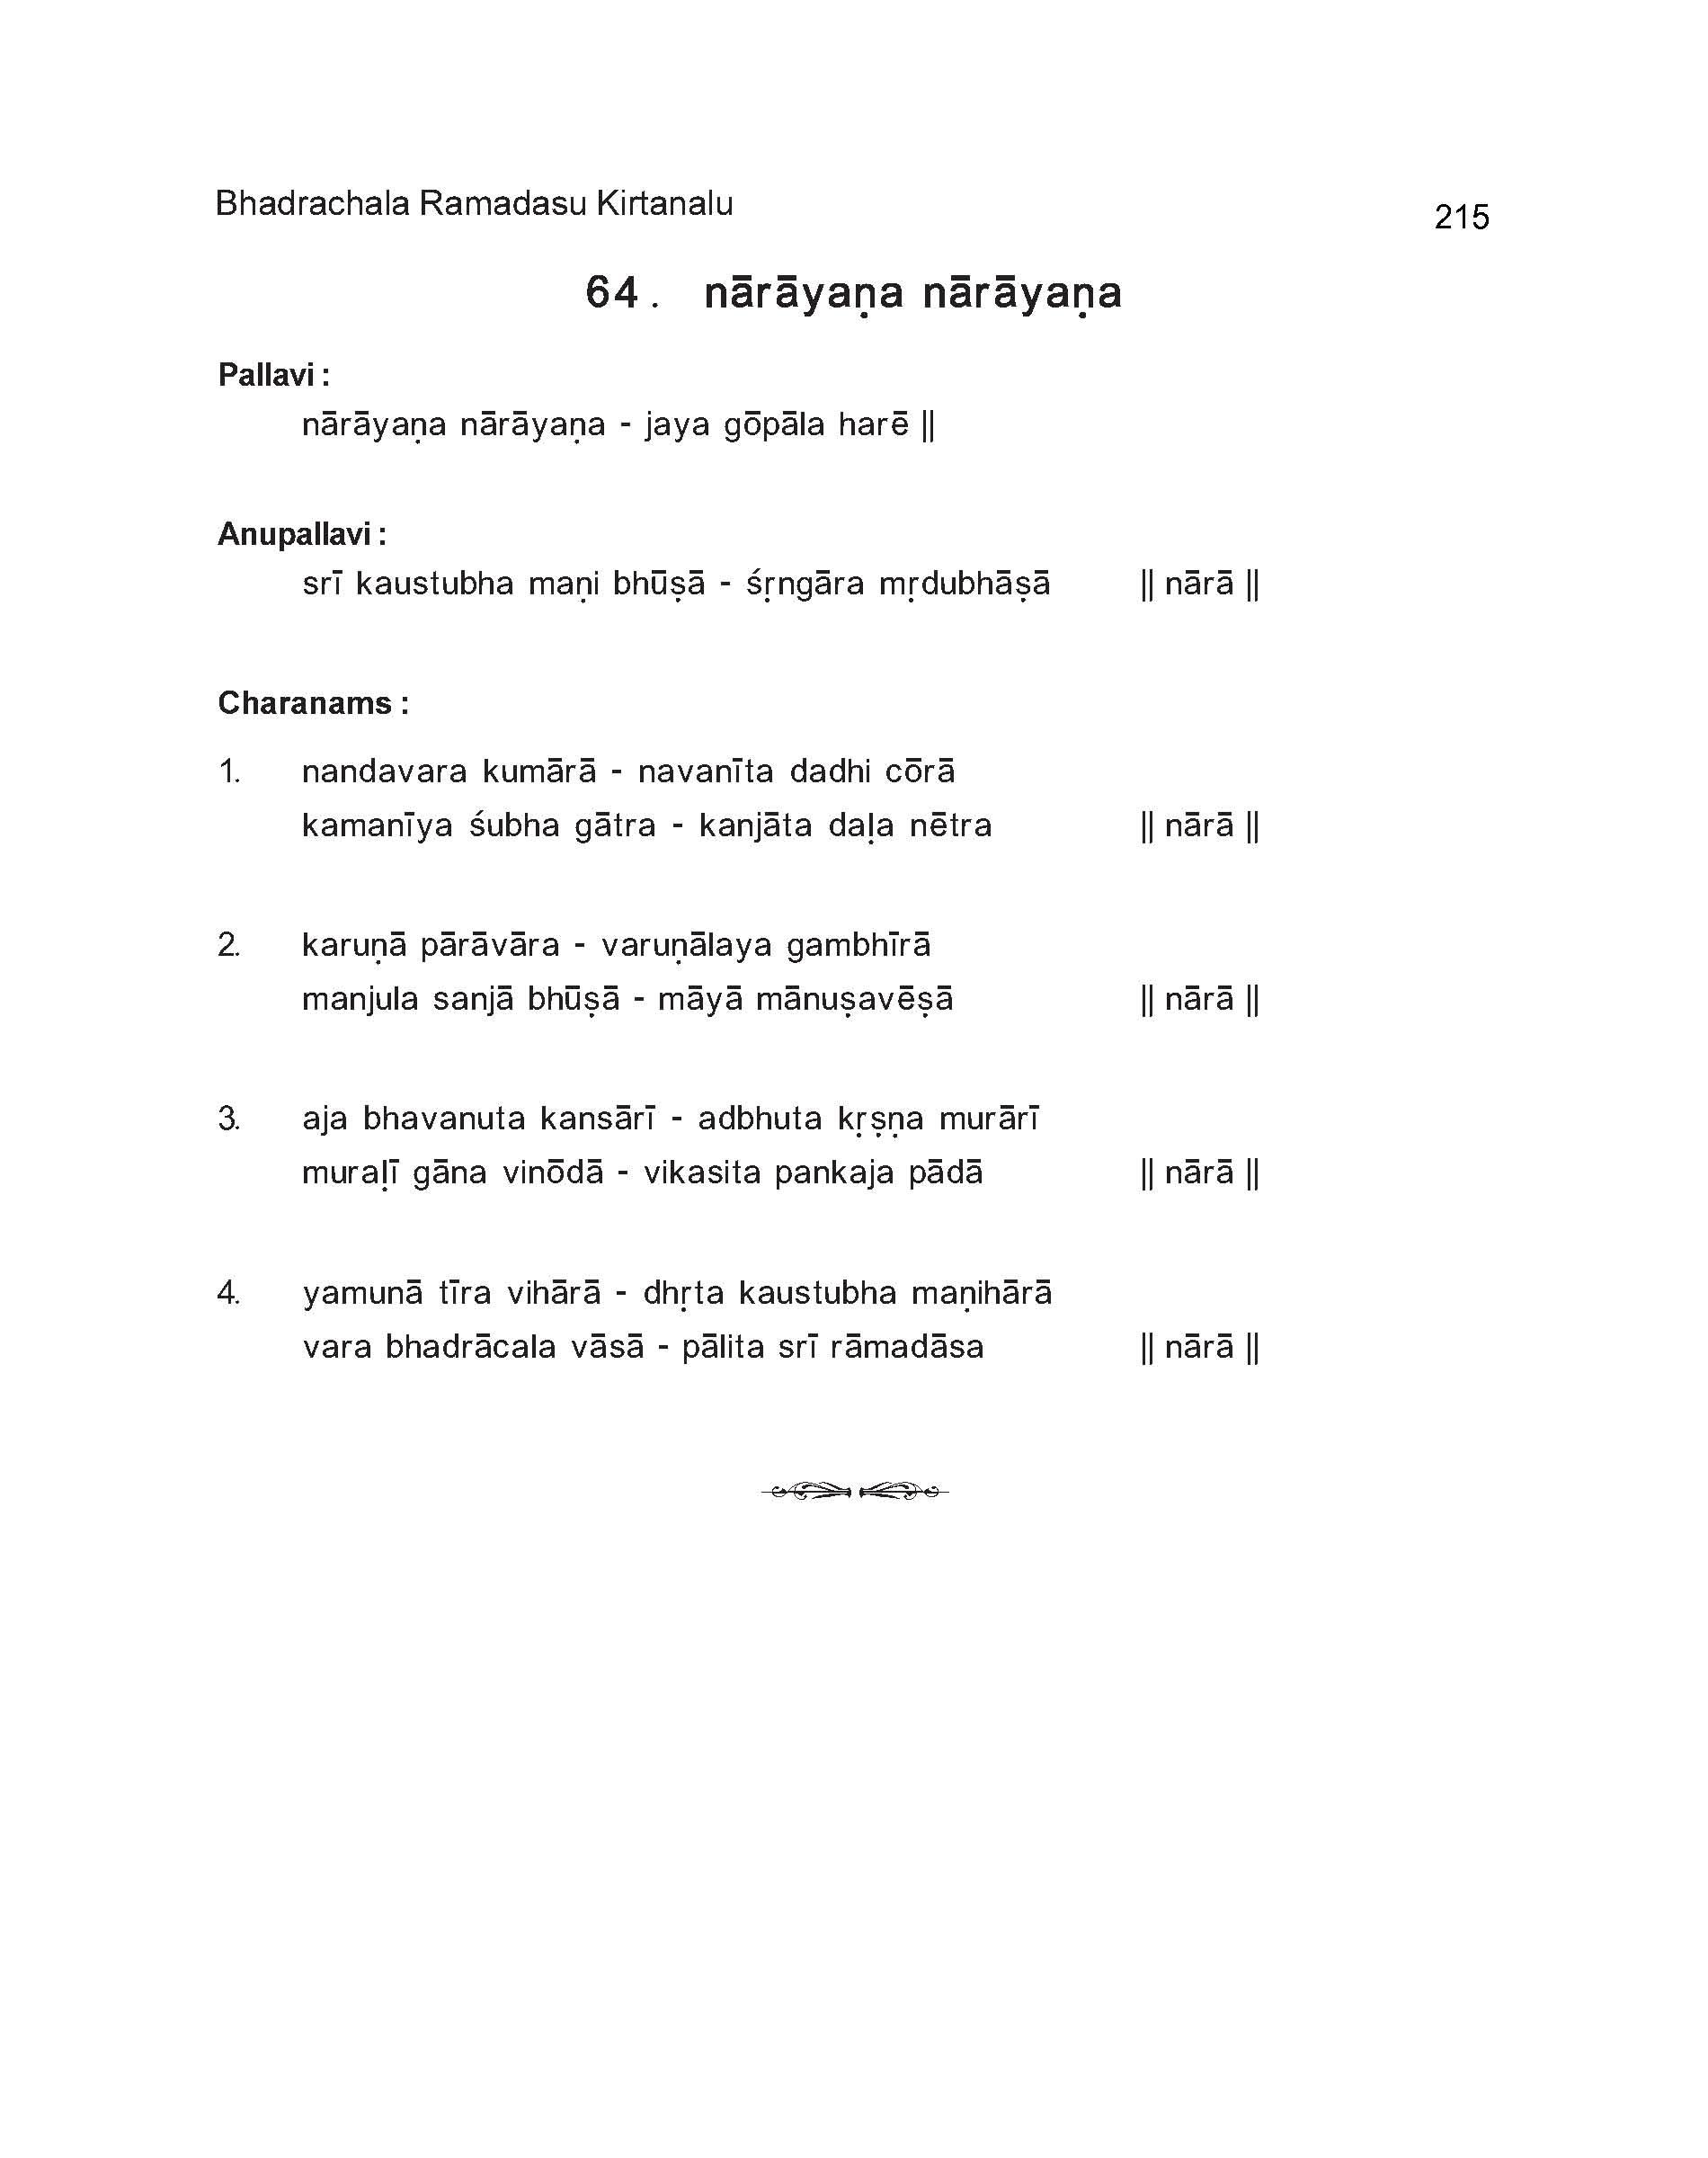 narayana narayana, bhadrachala ramadasu keertanalu